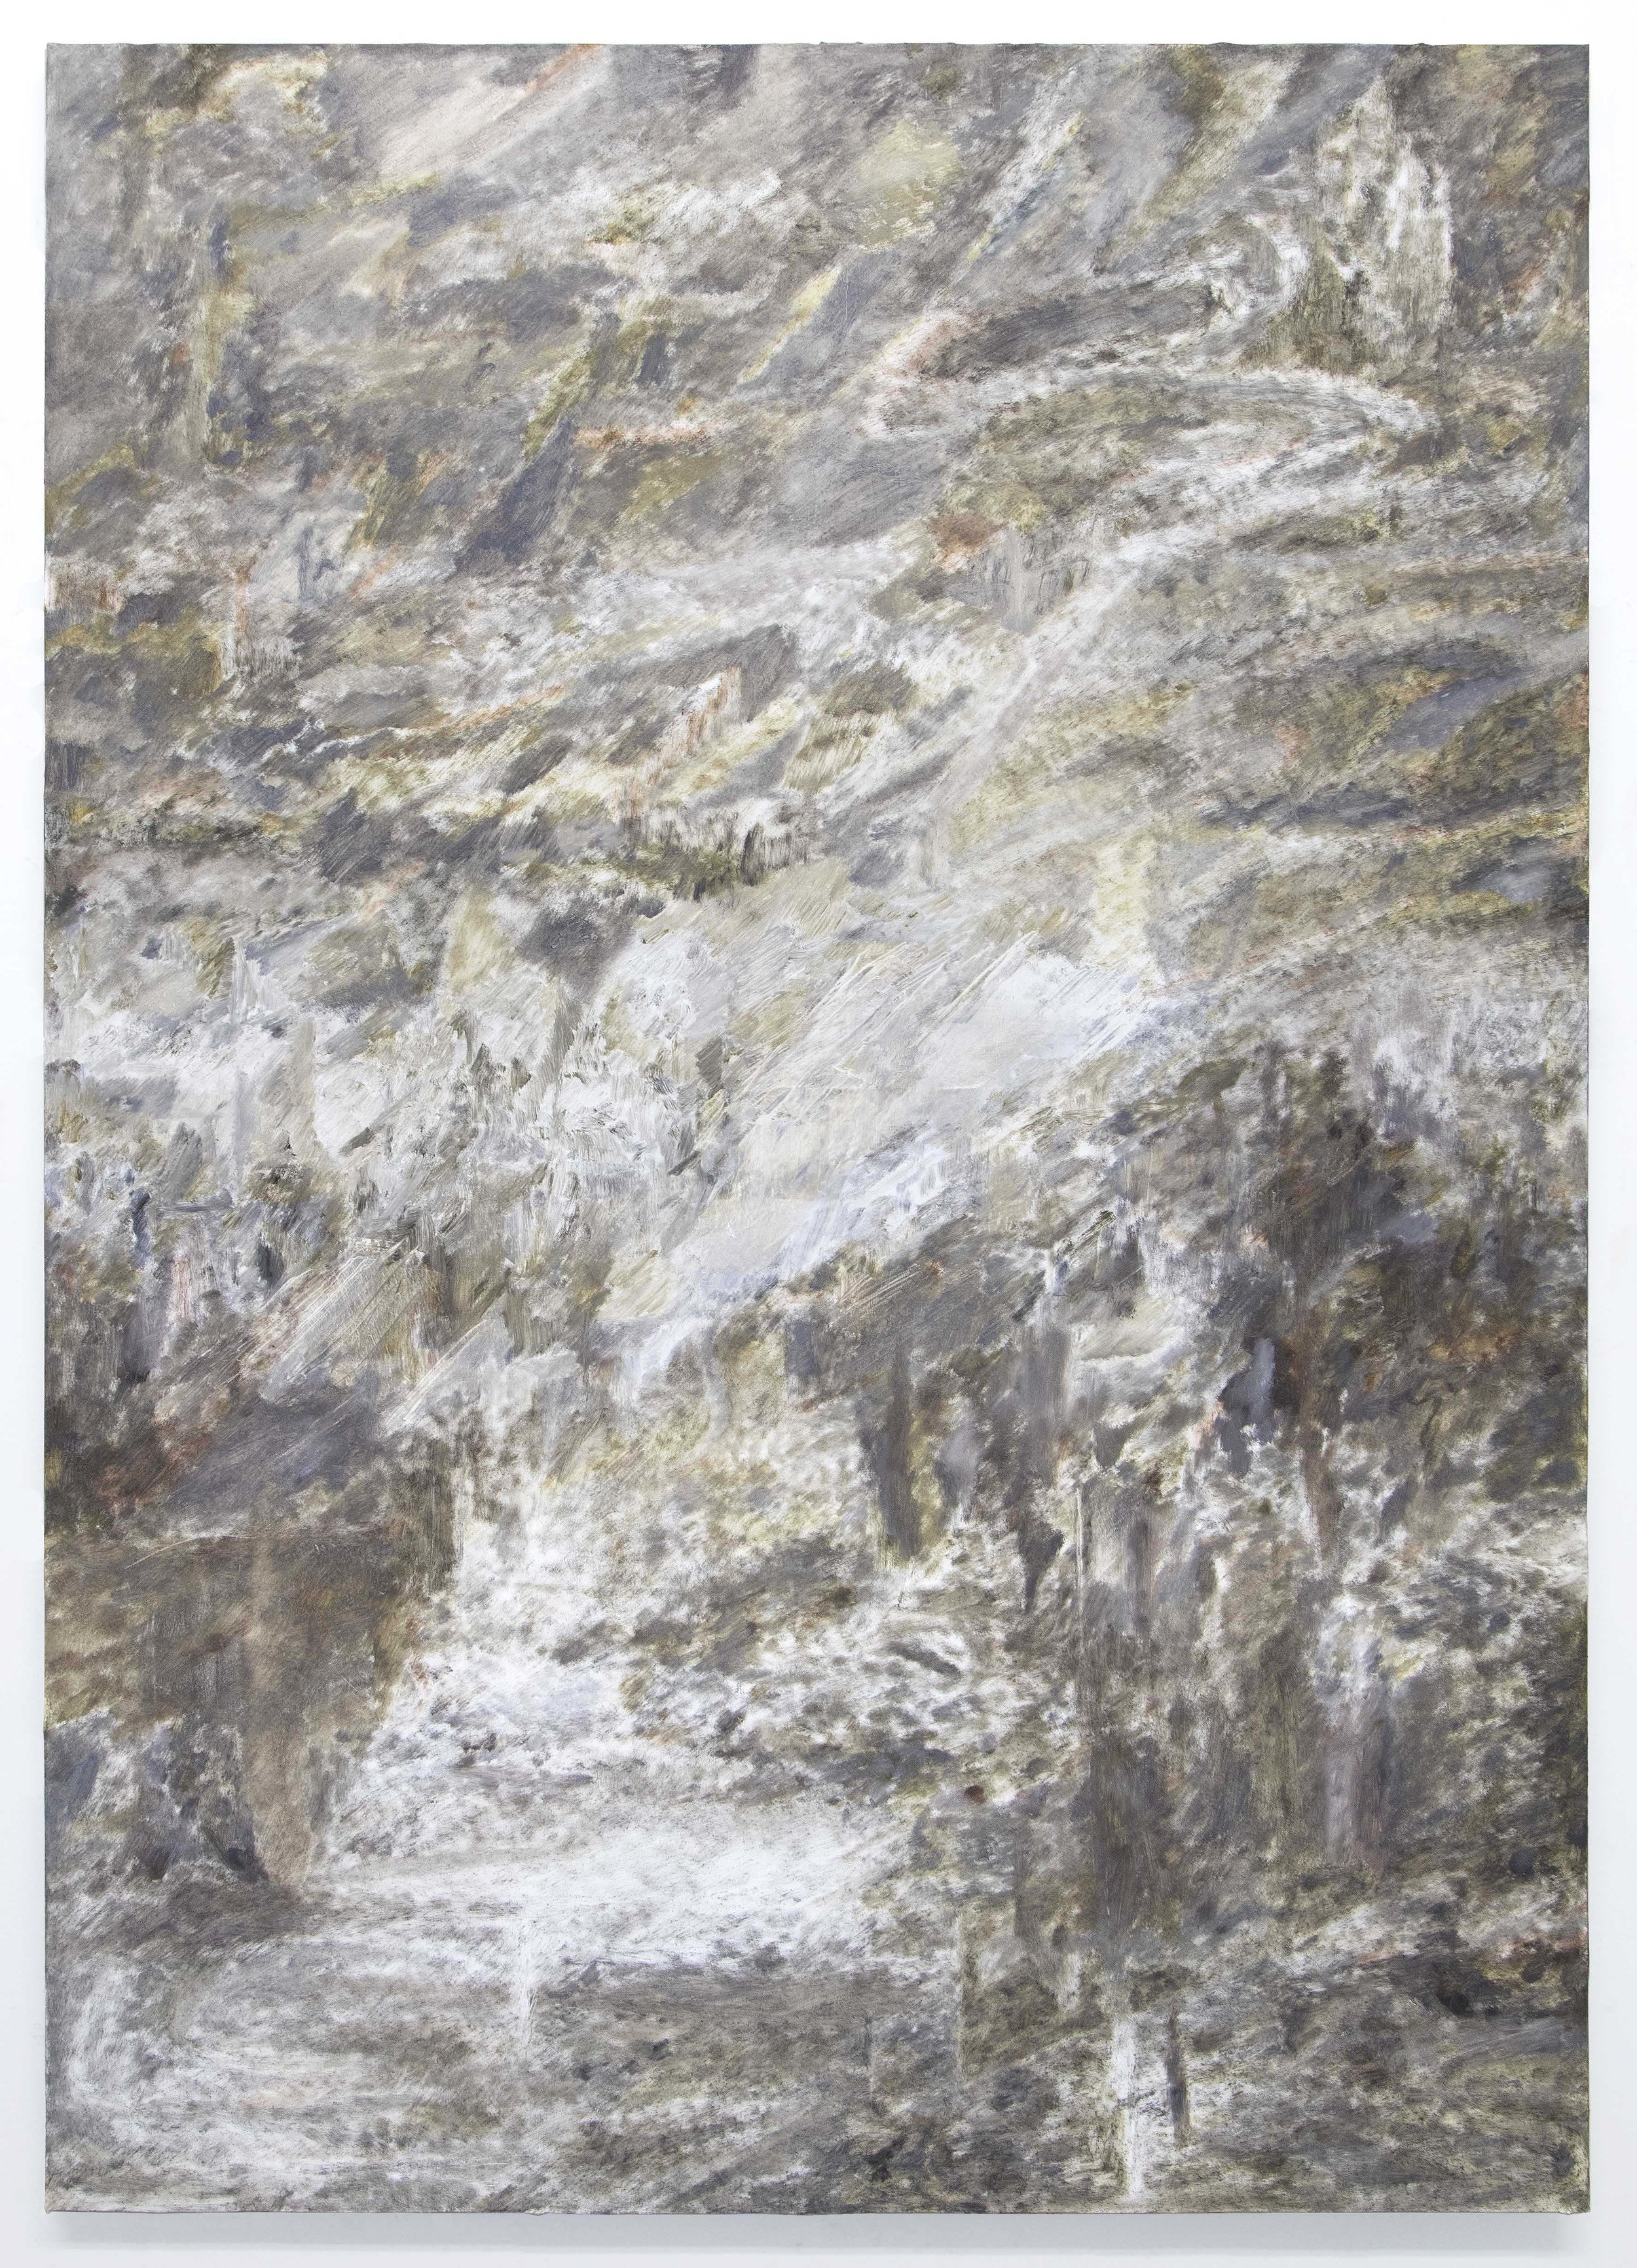 Tim Bučković, Untitled, 2017, oil on linen, 122 x 86cm